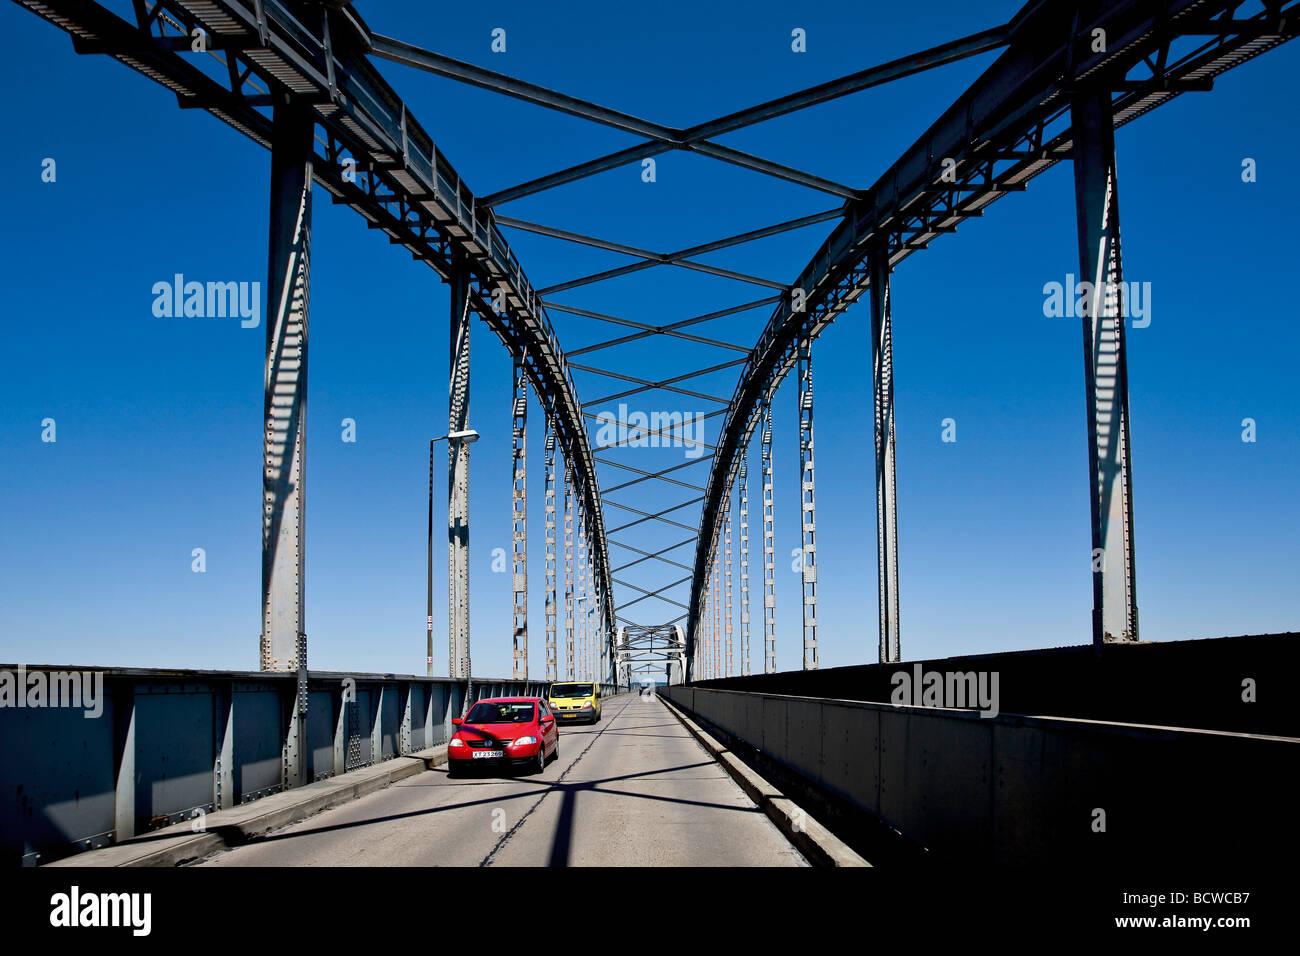 Crossing the Storestrom Bridge between Zealand and Falster in Denmark, Scandinavia, Europe - Stock Image